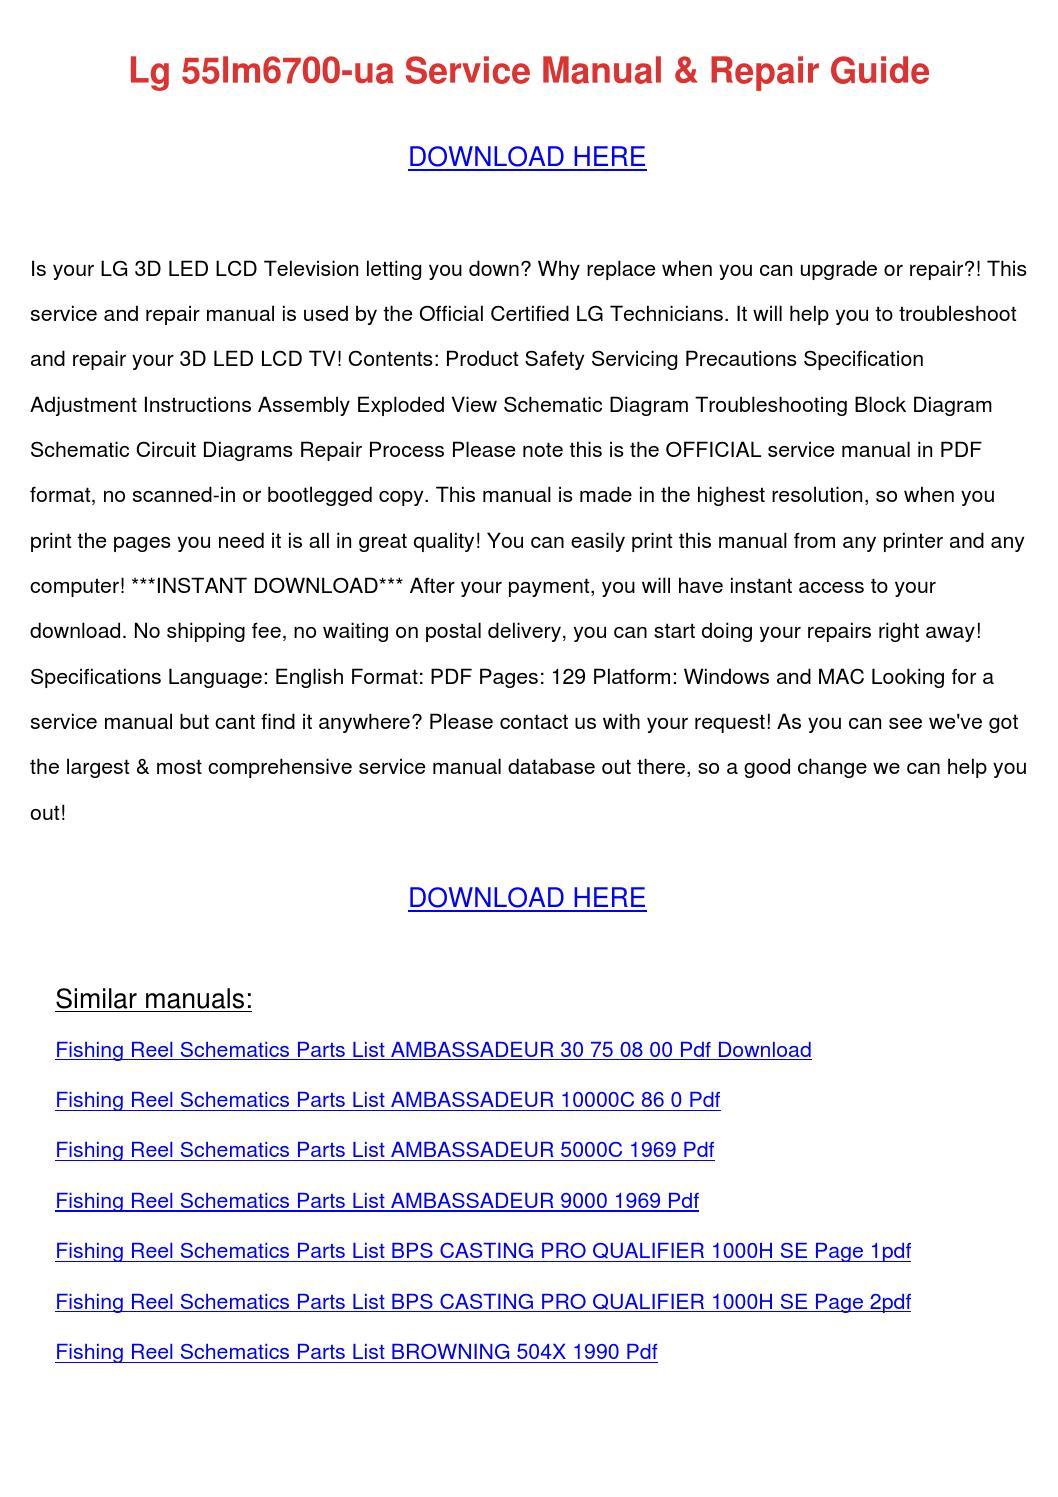 lg 55lm6700 ua service manual repair guide by kayleeibarra